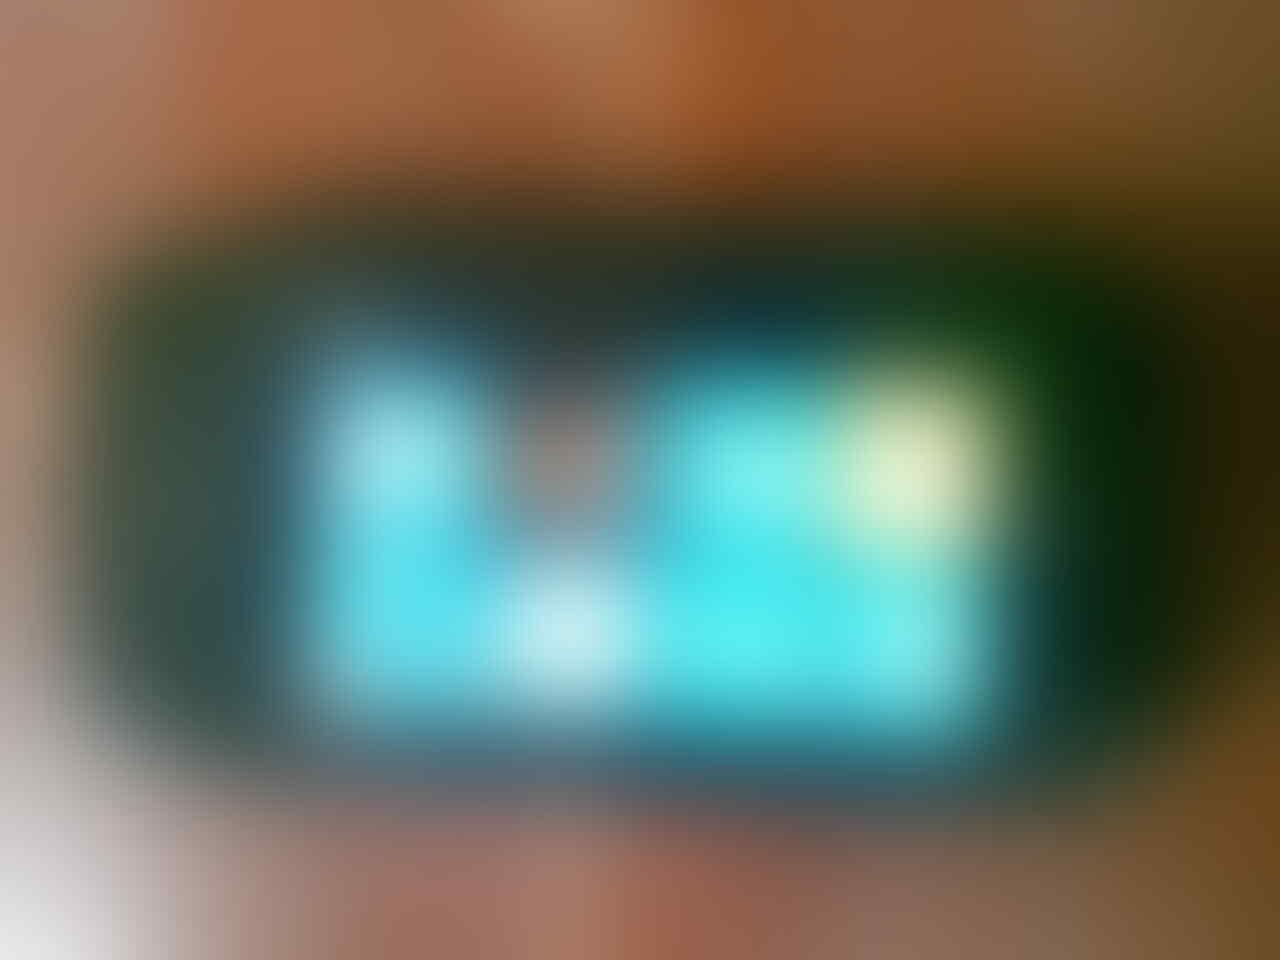 [WTS] Nokia 710 masih gresssssssss